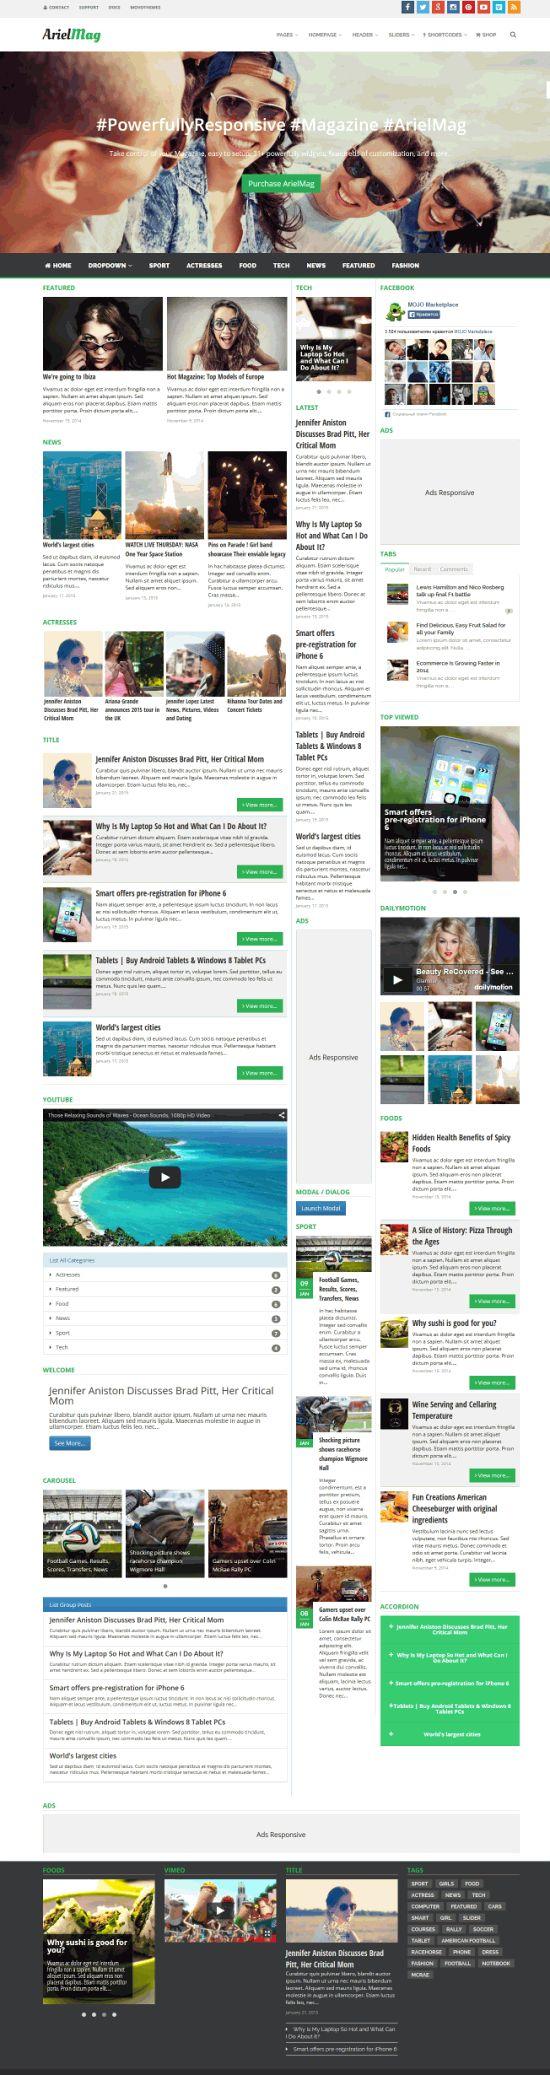 ArielMag v1.1.3 – адаптивный журнальный шаблон для WordPress